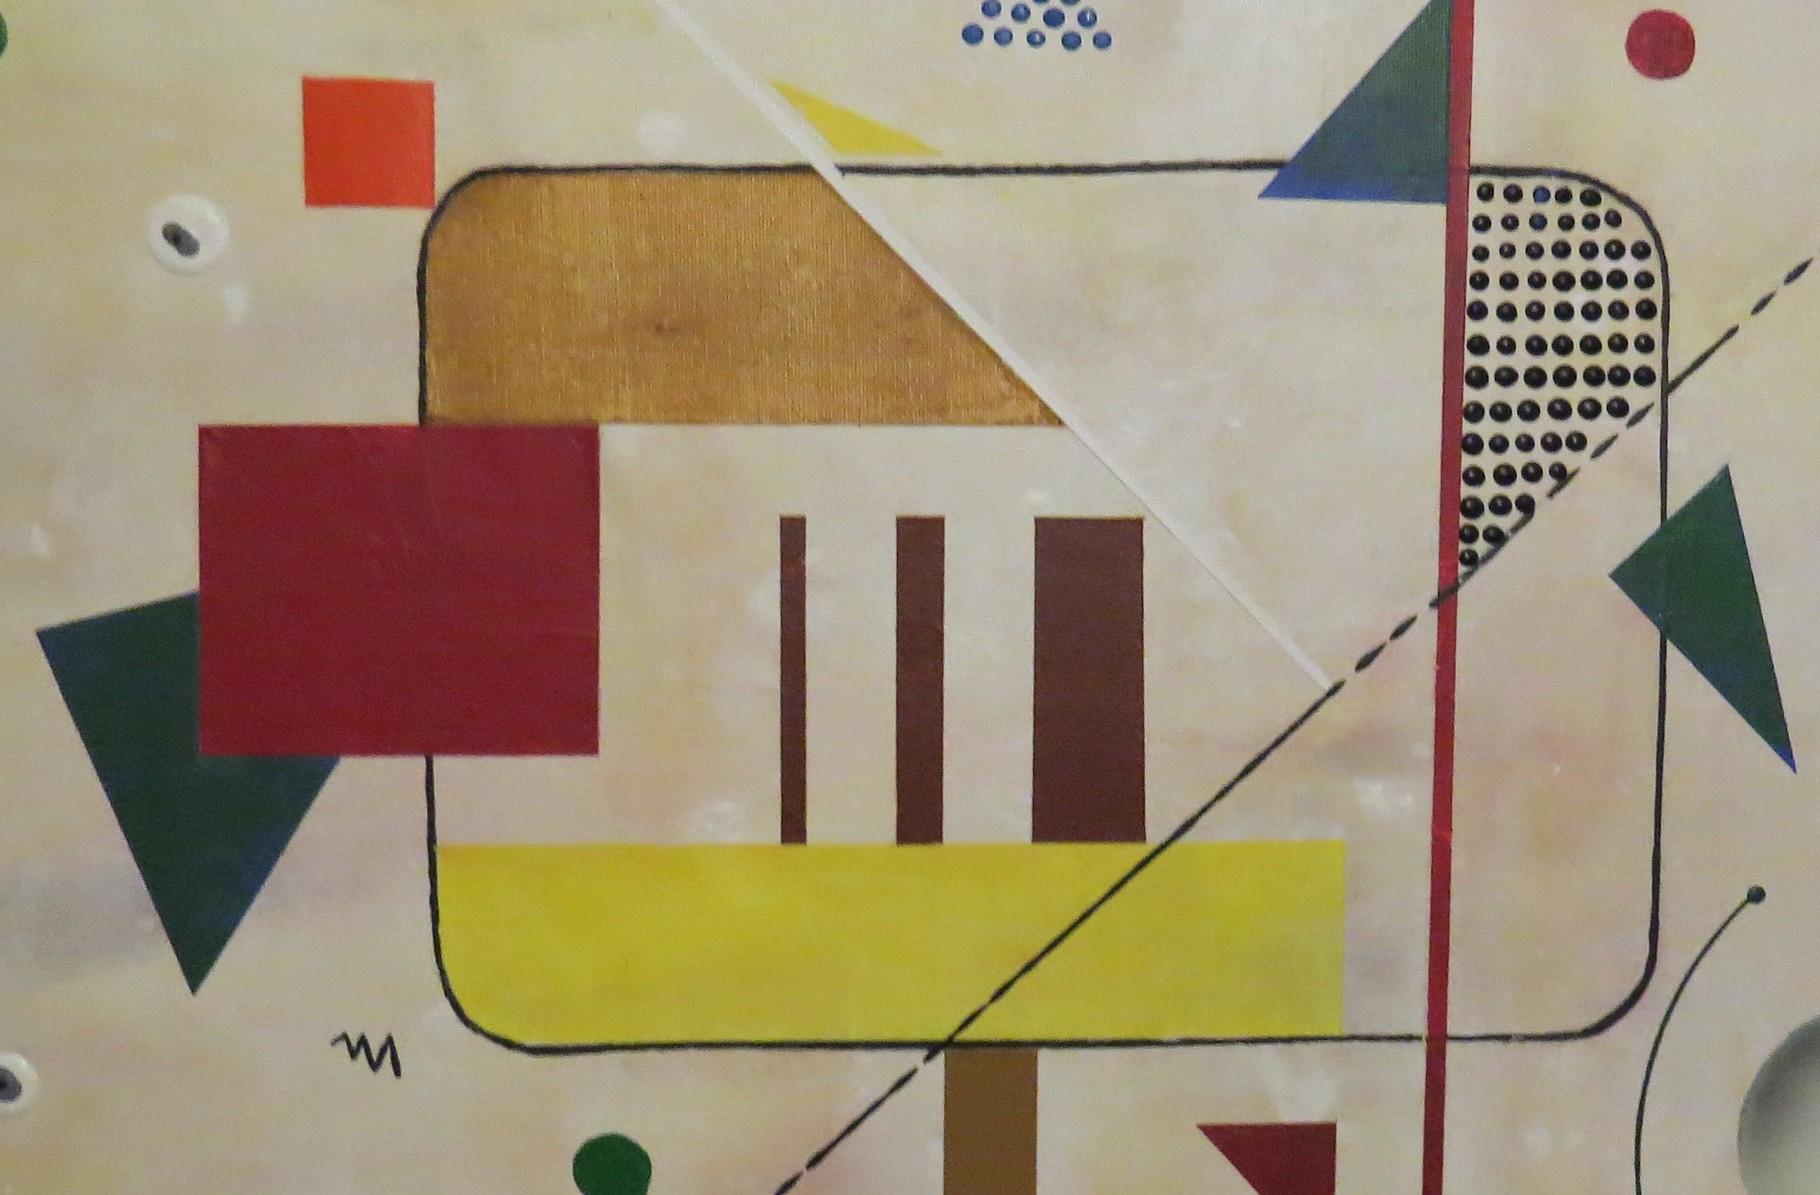 entrevue zoom1 - daluz peinture abstraite abstraction